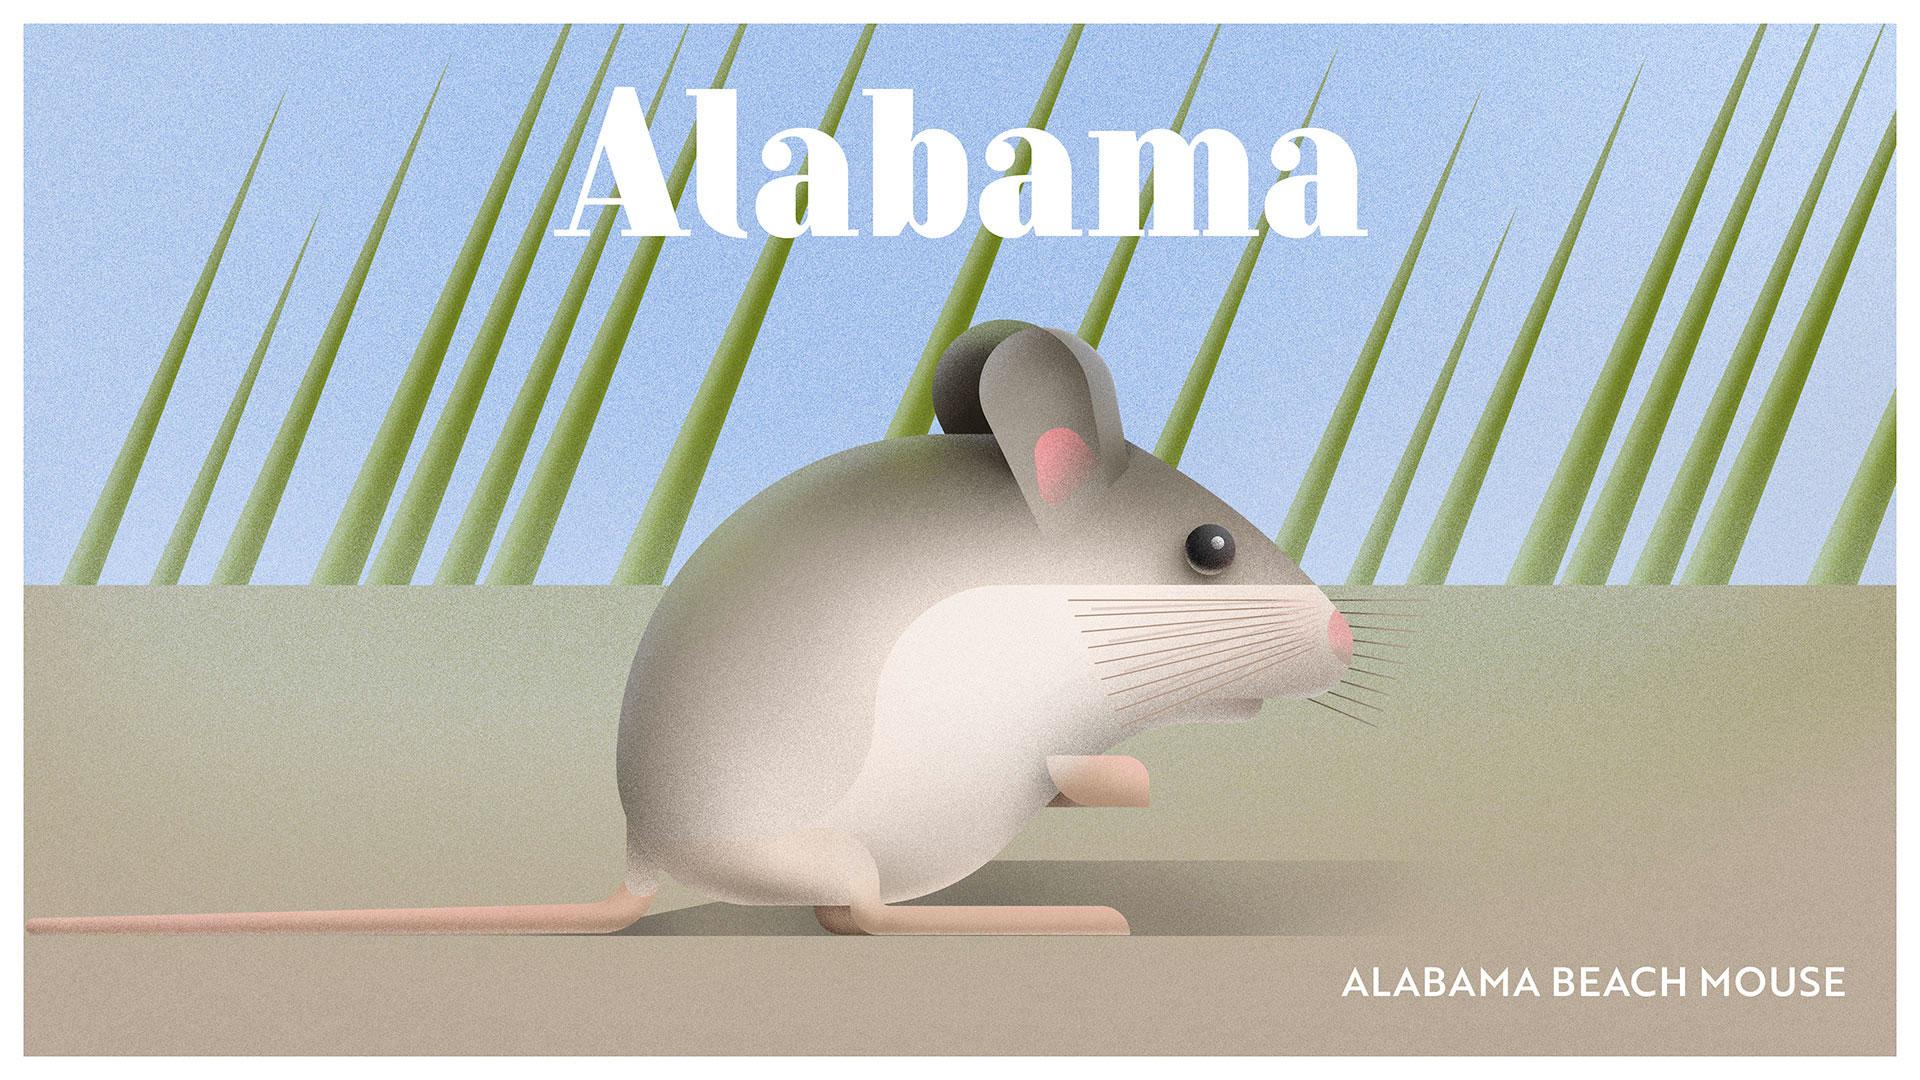 llustrators immortalise endangered wildlife